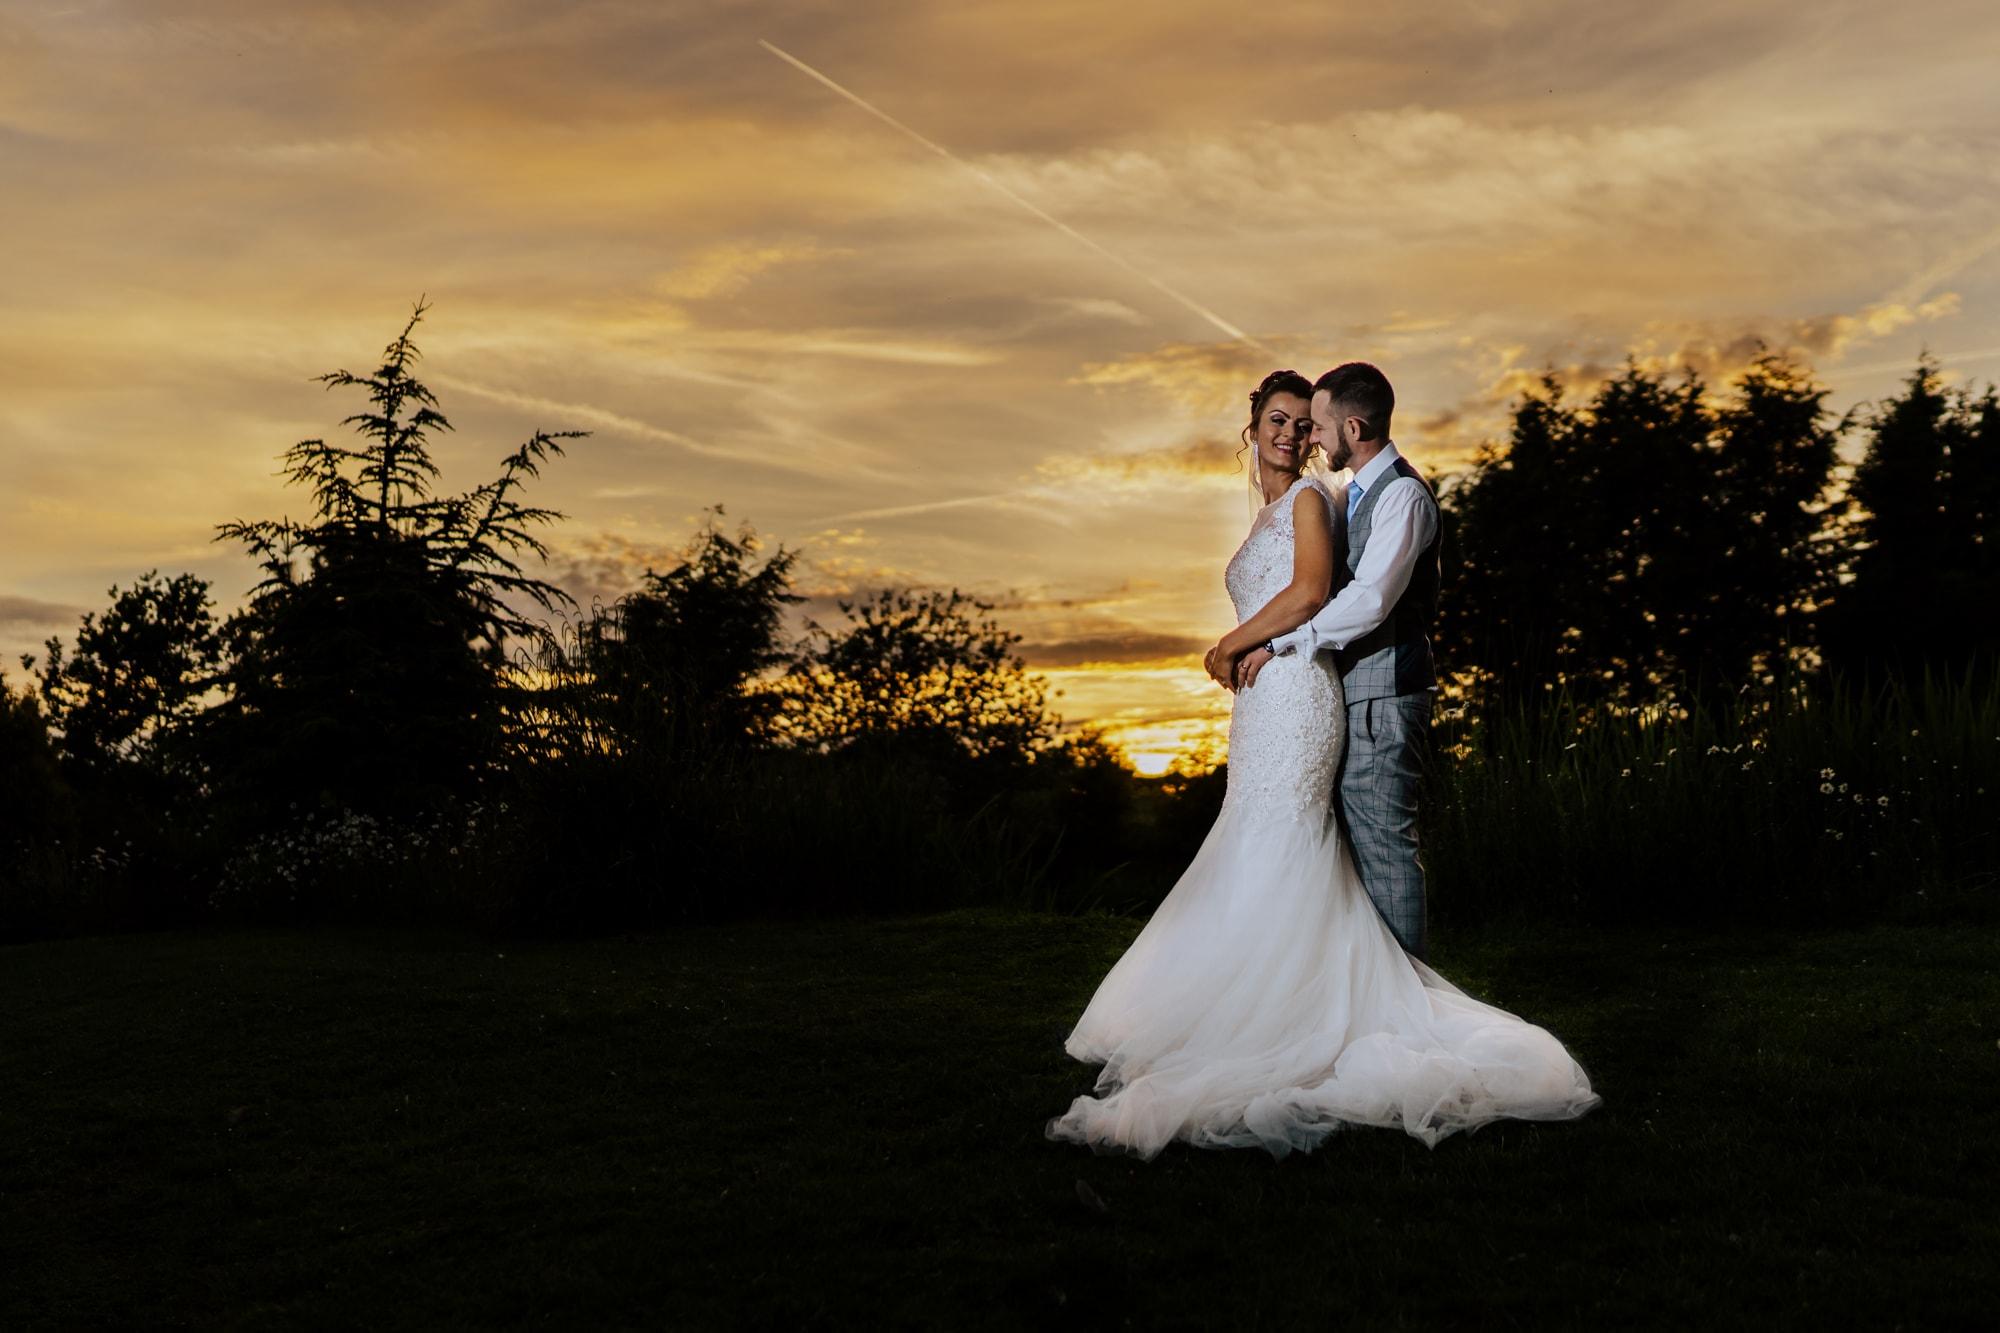 Sunset-The Ravenswood-wedding-venue.jpg